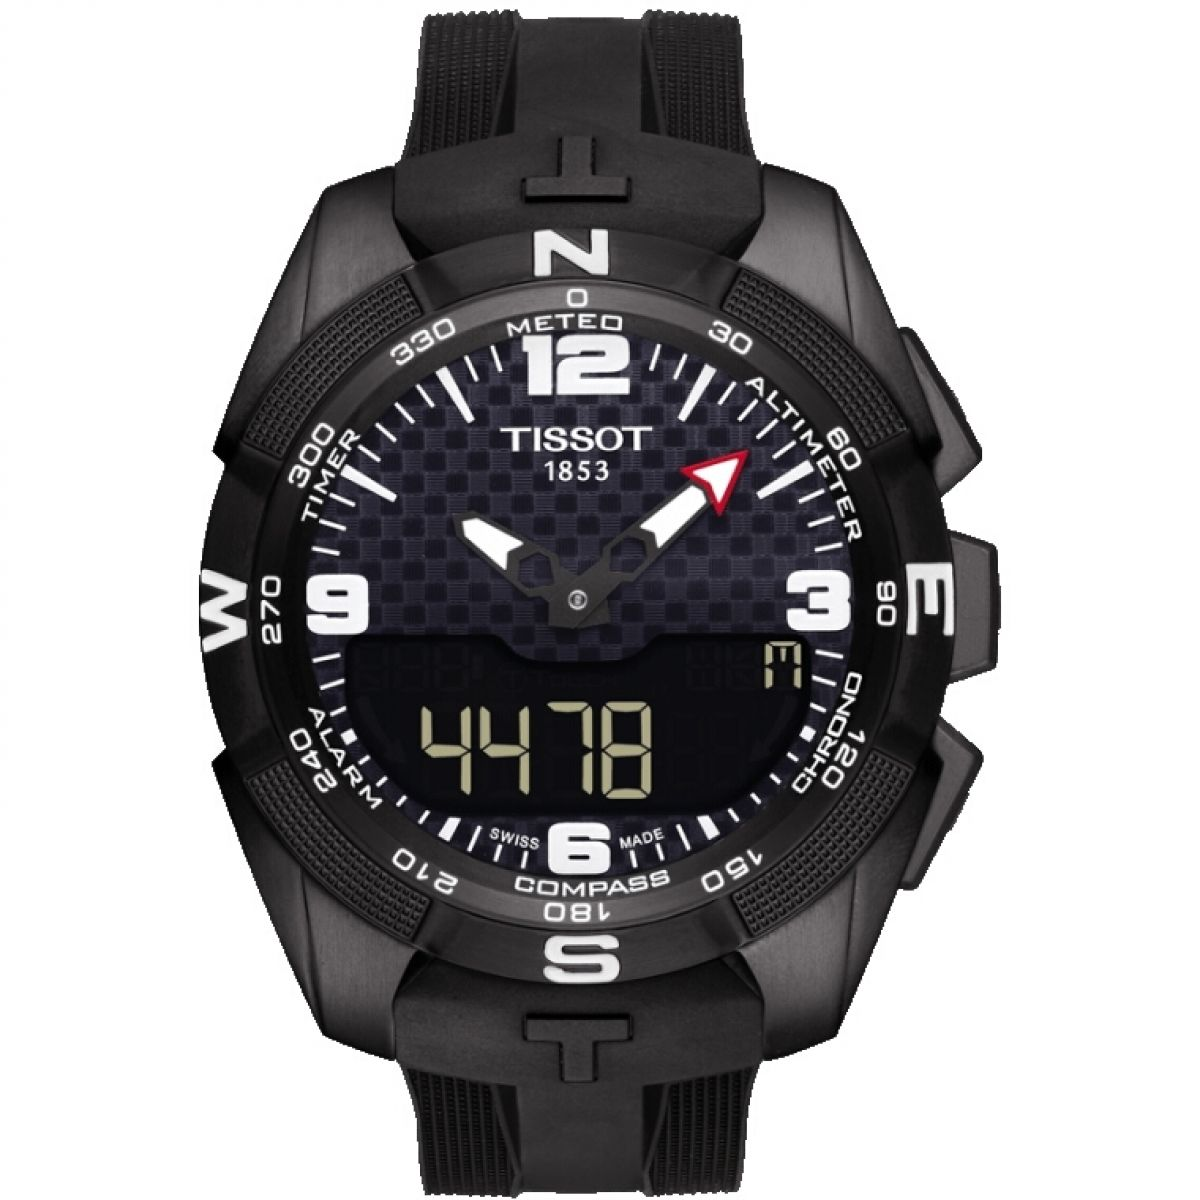 gents tissot t touch expert solar alarm chronograph watch rh watchshop com tissot t touch expert manual download tissot touch expert manuel